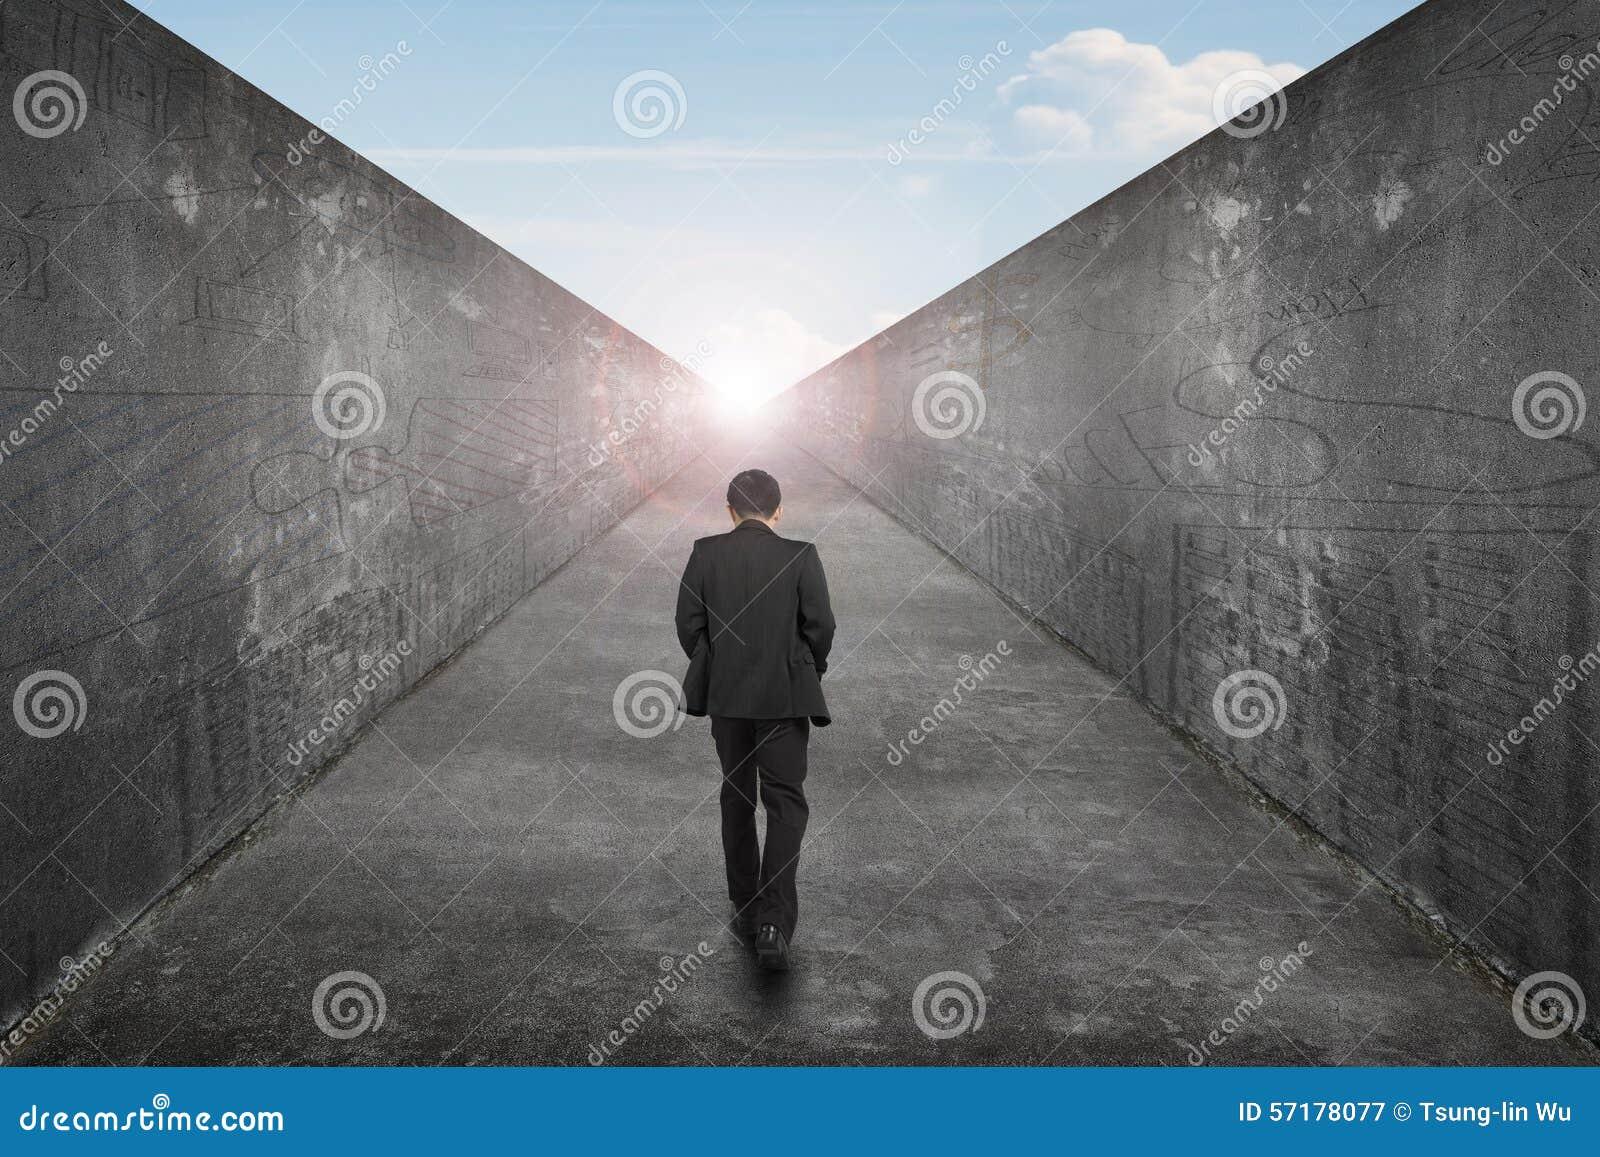 Businessman walking one way road toward exit sun sky view